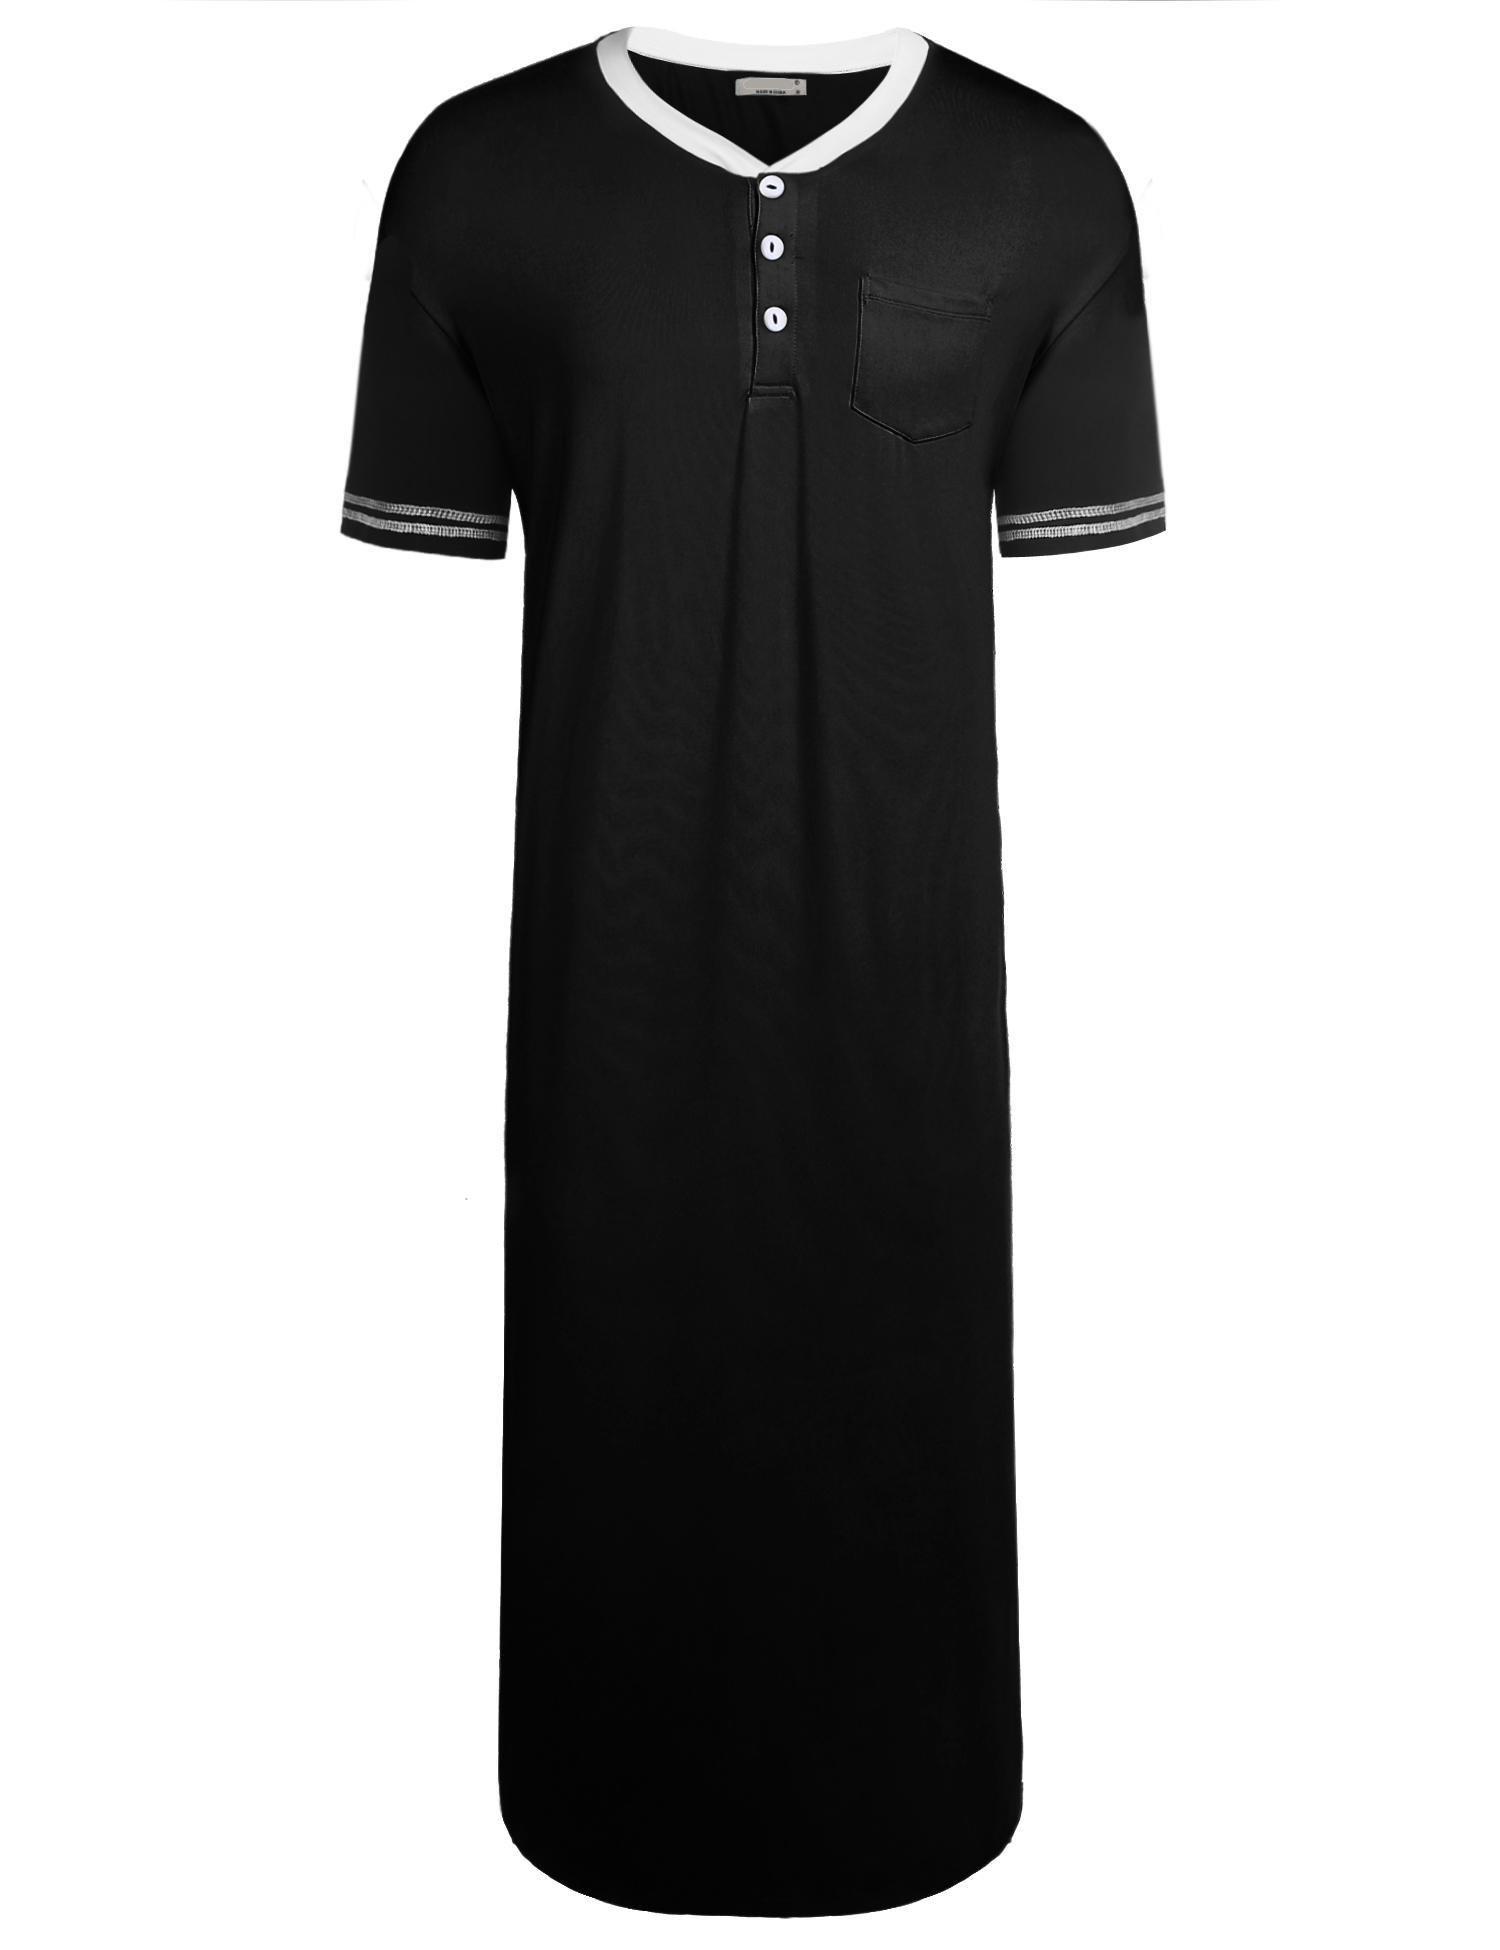 Goldenfox Loose Sleep Shirt For Men Long Big & Tall Sleepdress Henly Pajama Nightwear (Black, XL)